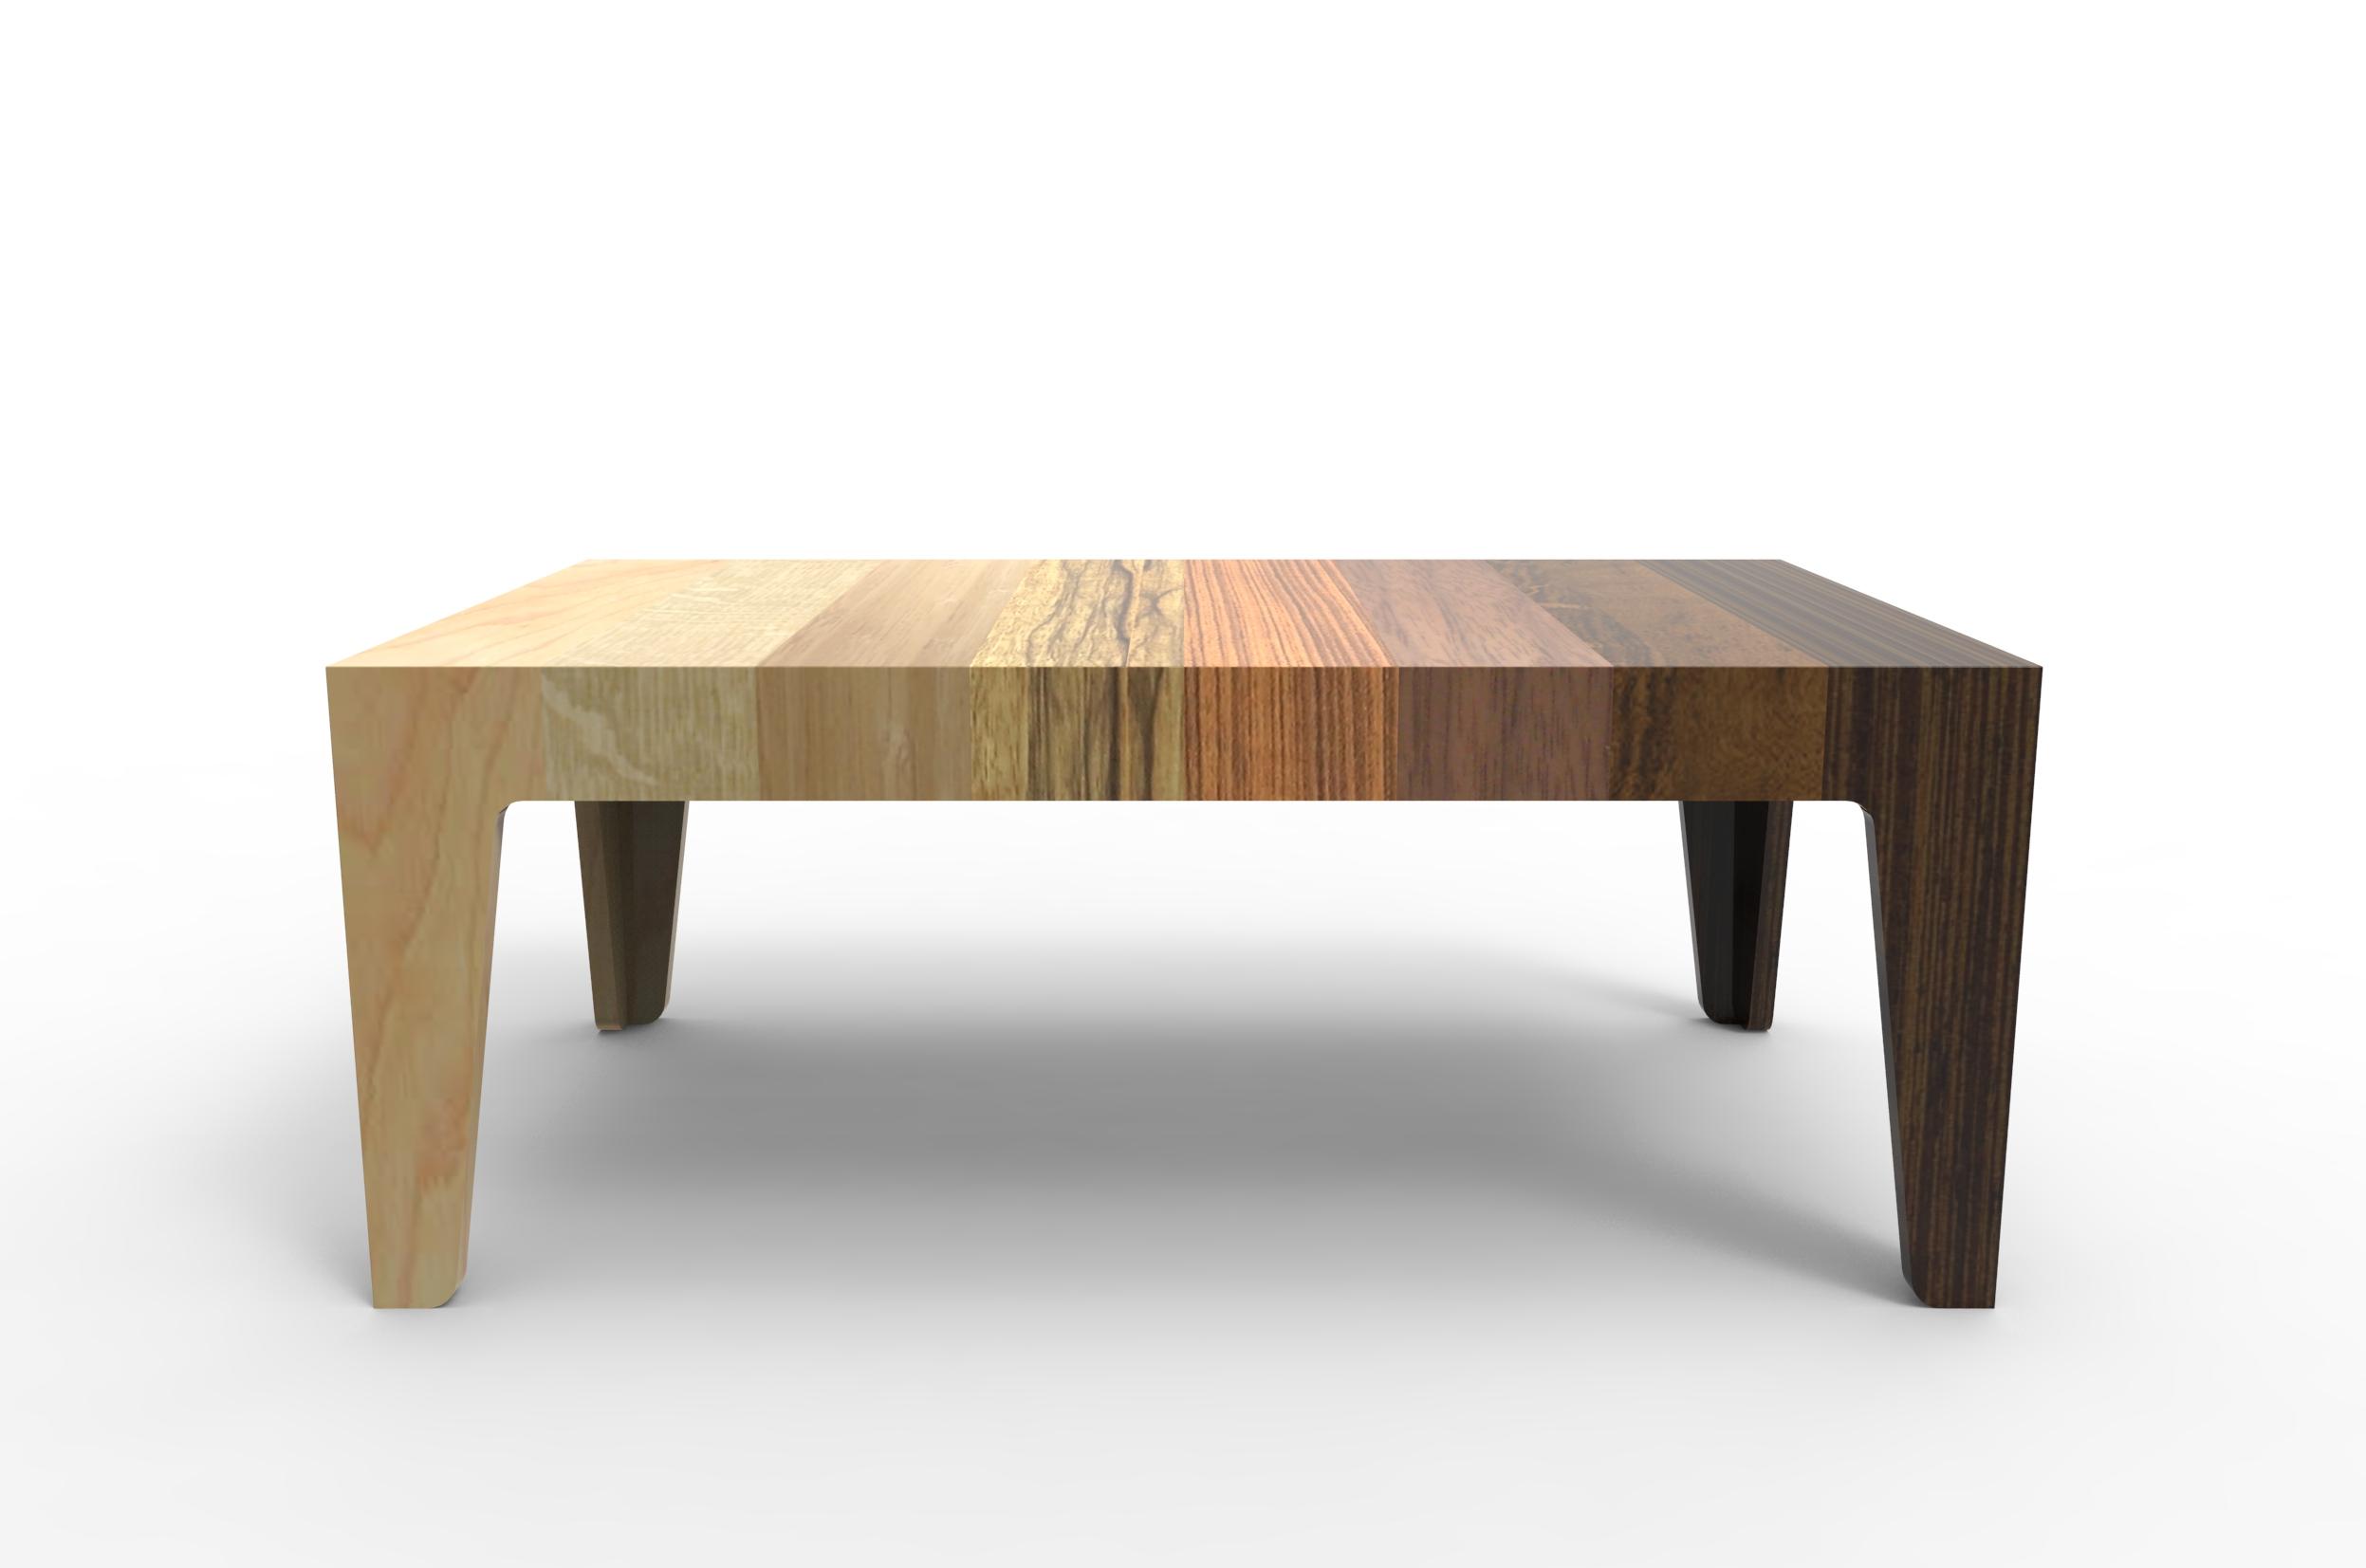 Eli chissick switzercultcreative for Table th gradient